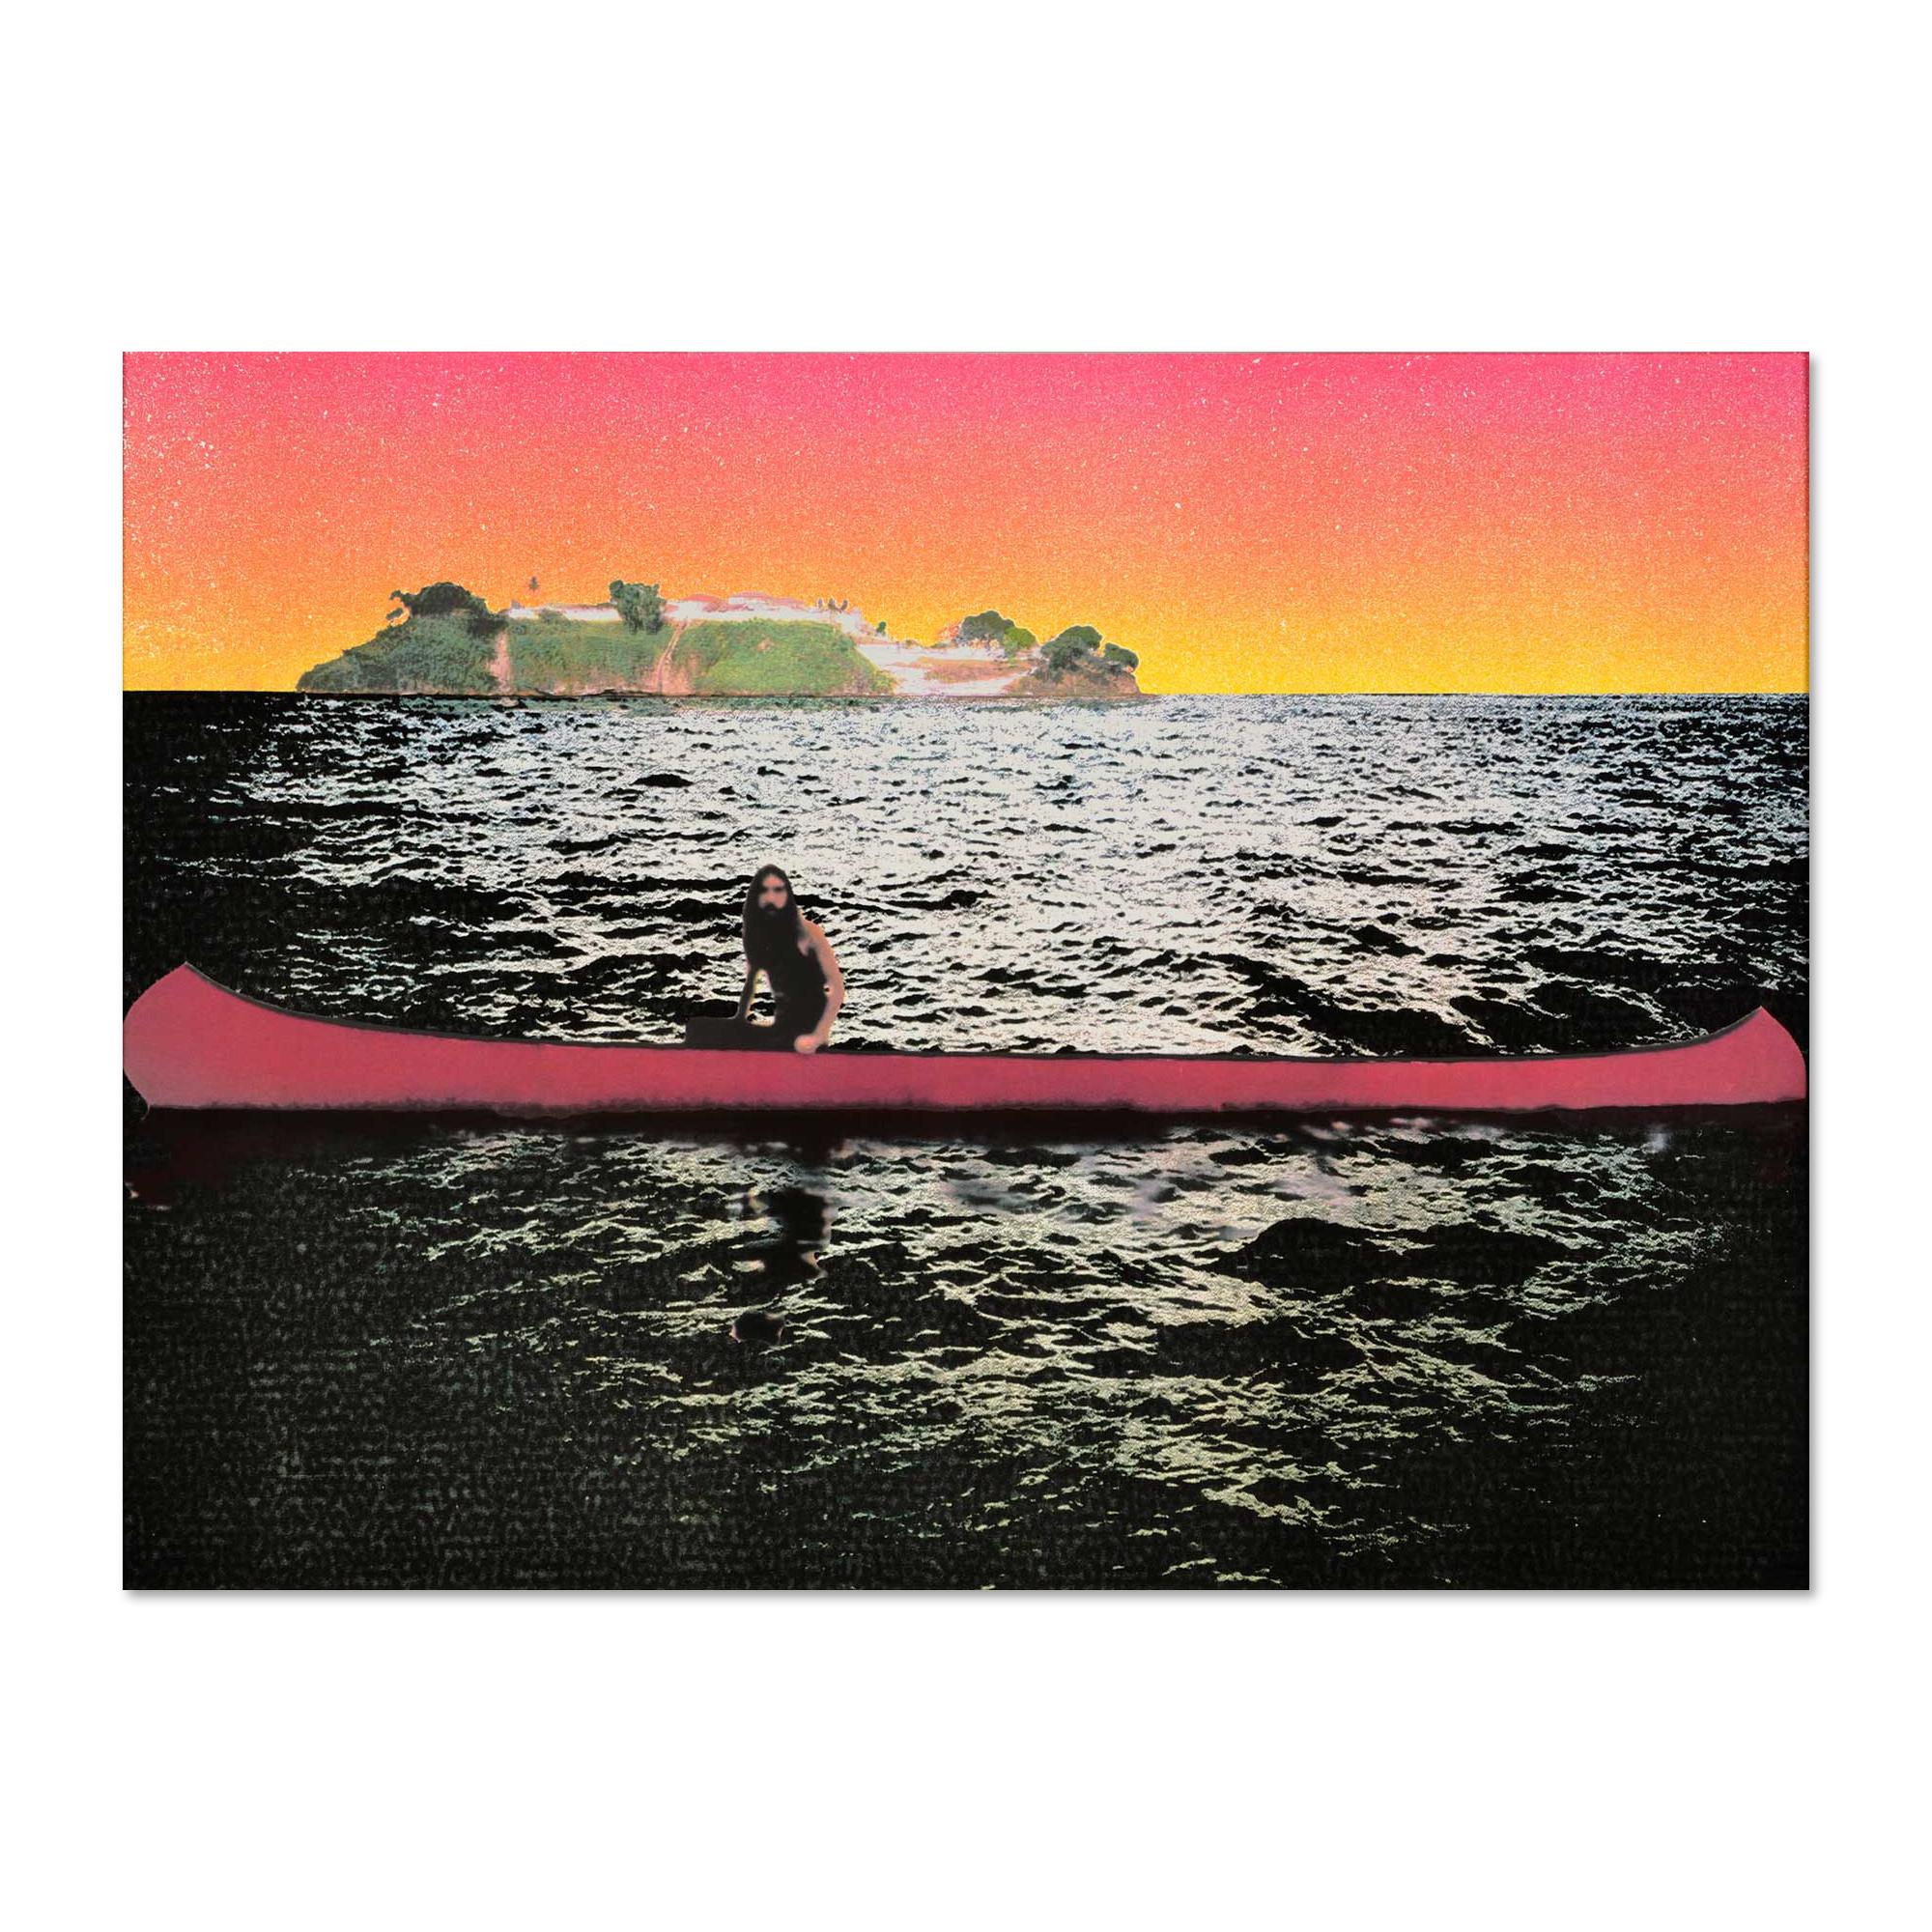 Canoe Island by Peter Doig